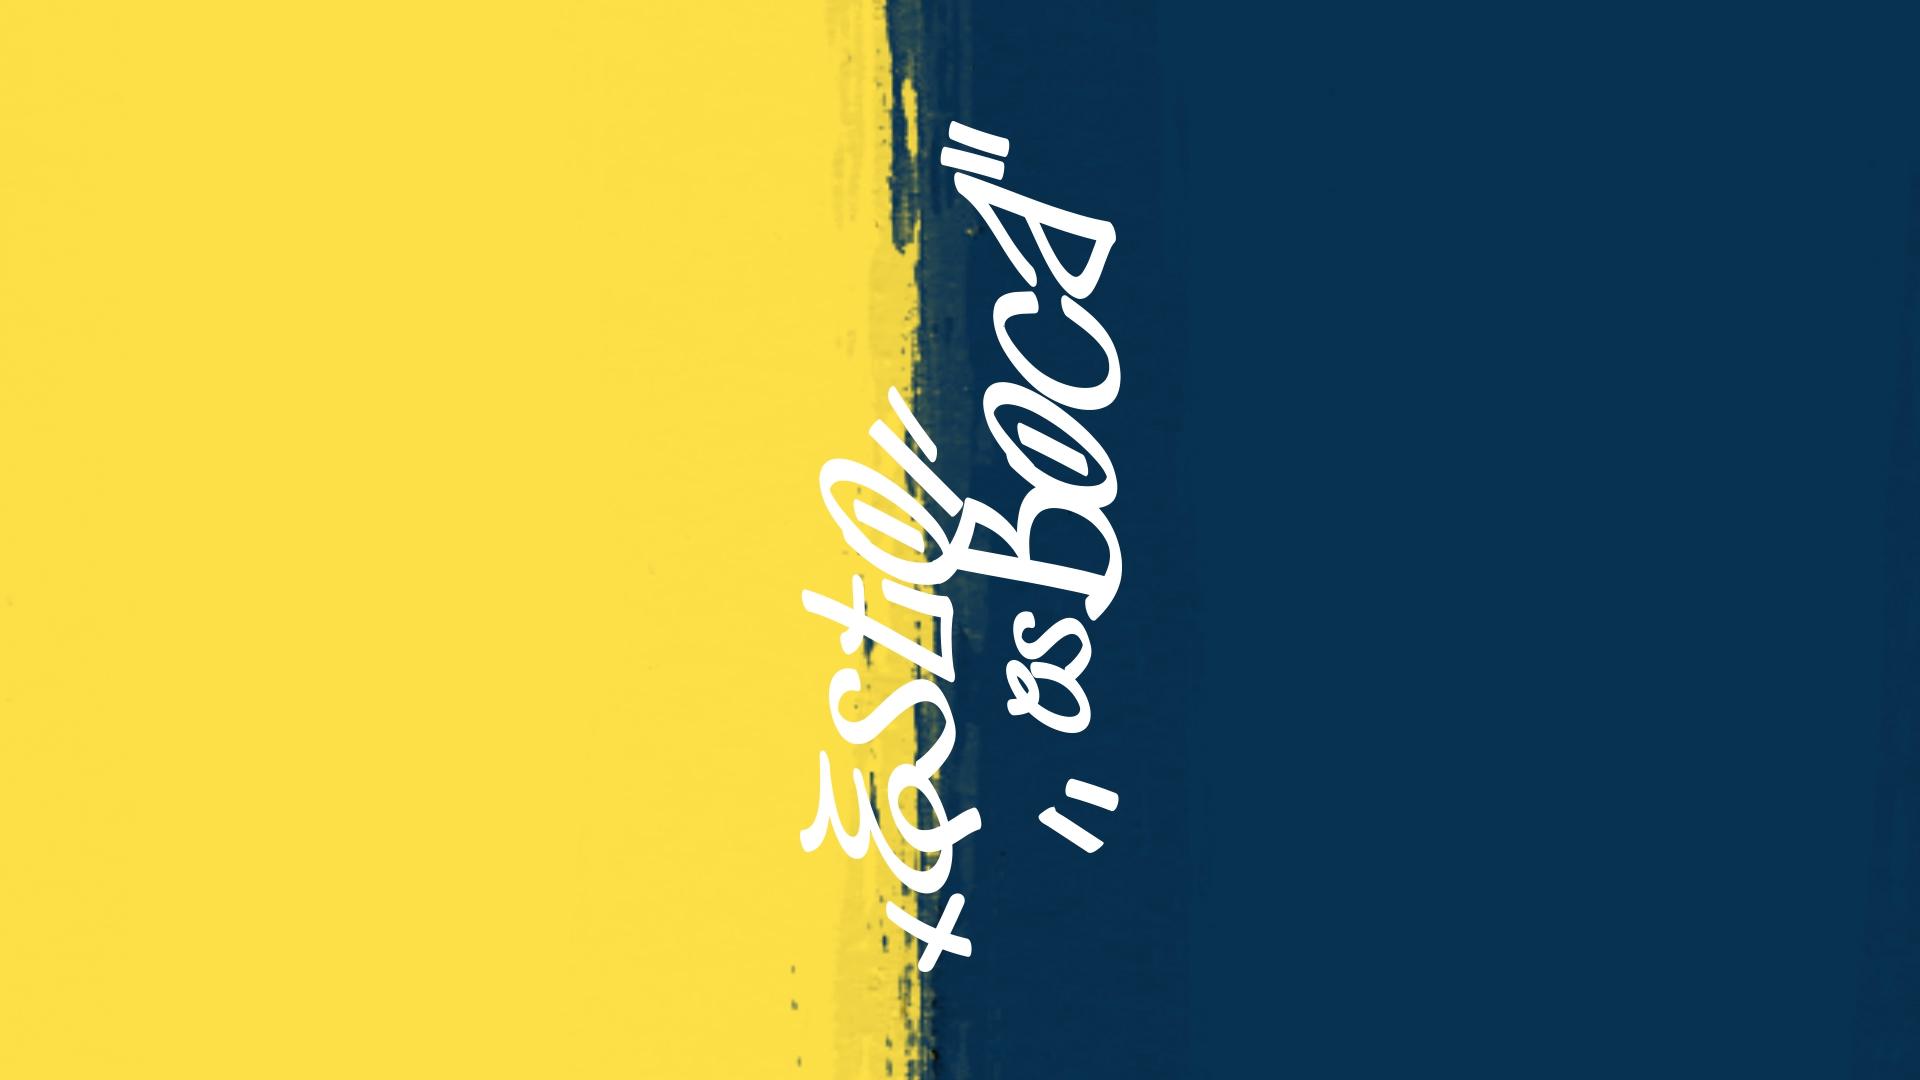 This is Boca Typography_10.jpg